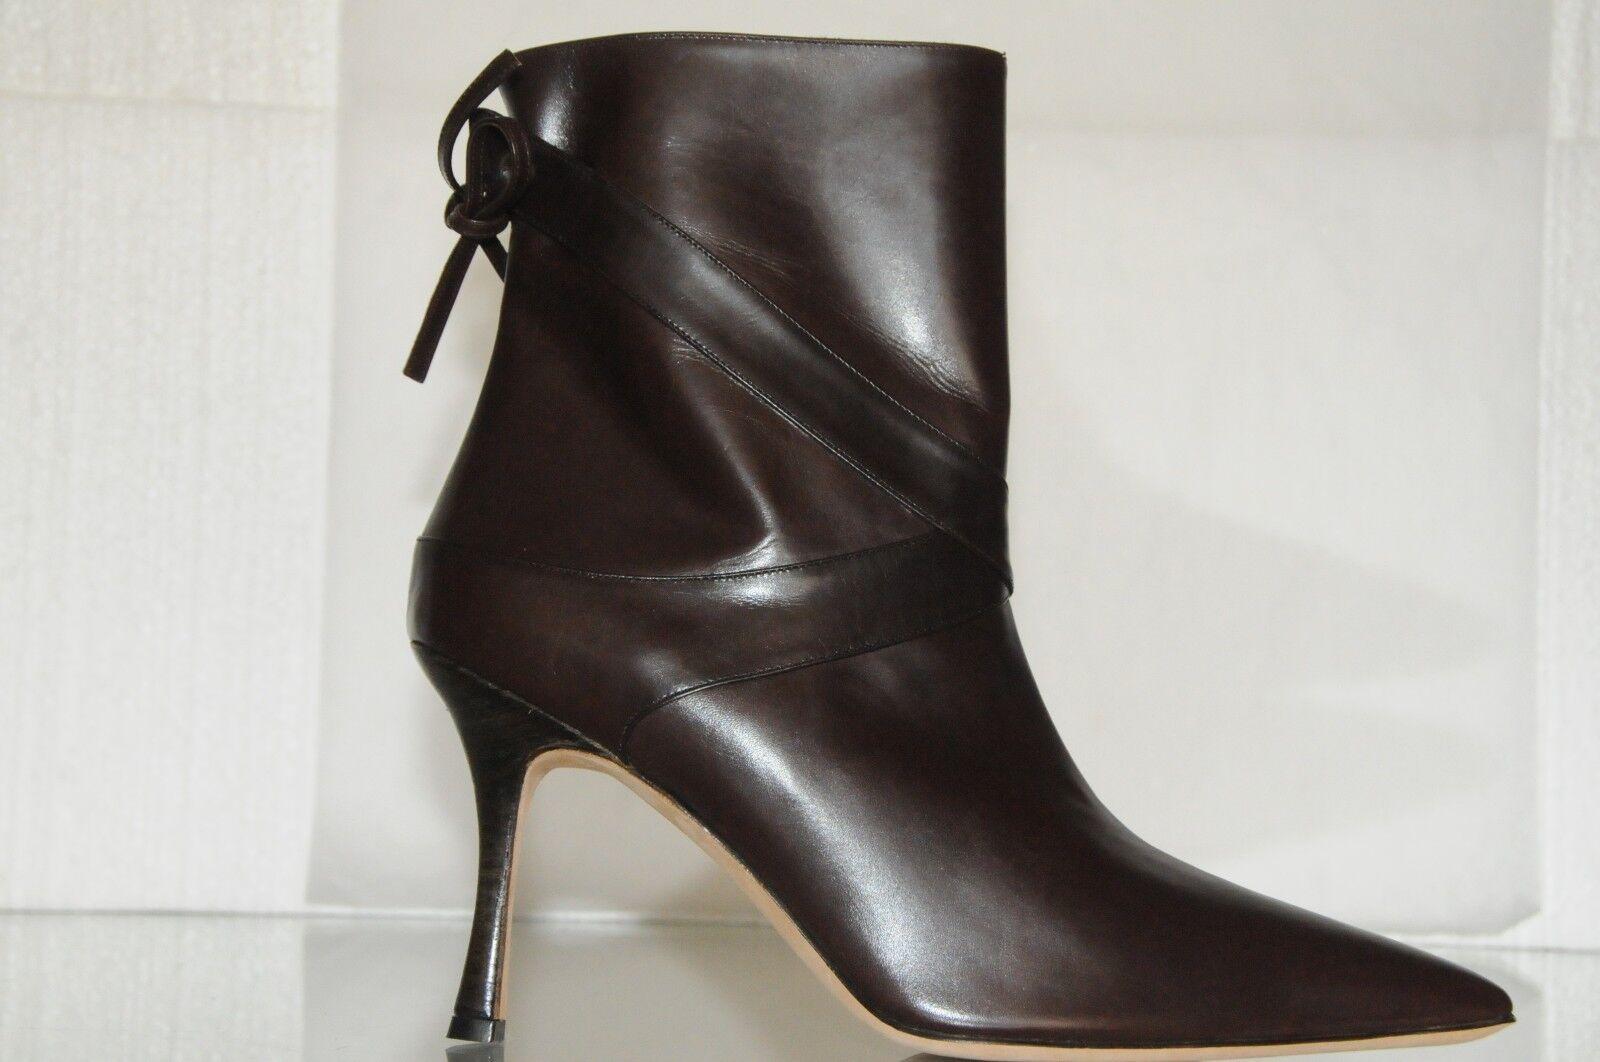 Neu Manolo Blahnik Klassisch Stiefeletten Leder Dunkelbraun Schuhe 39